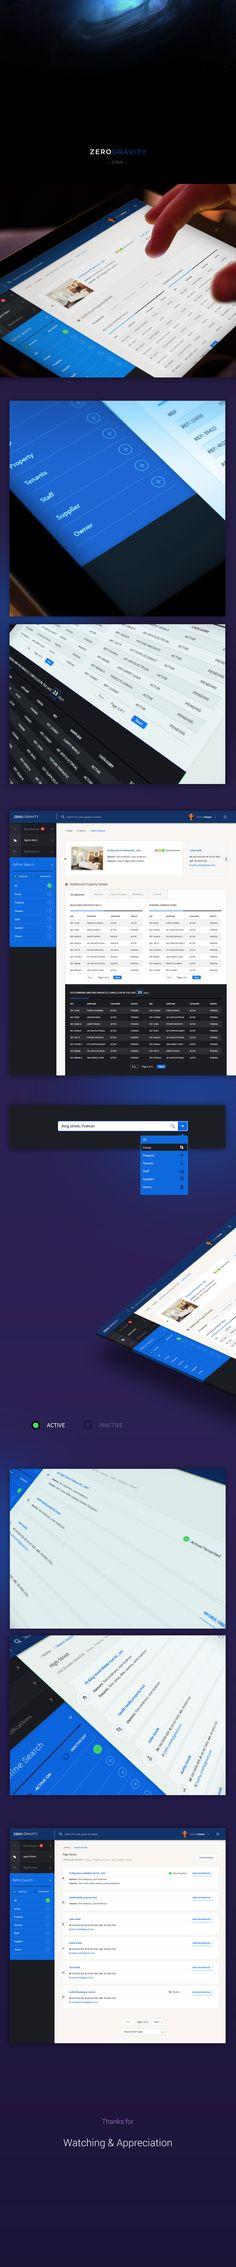 CRM Dashboard - ZERO GRAVITY on Behance